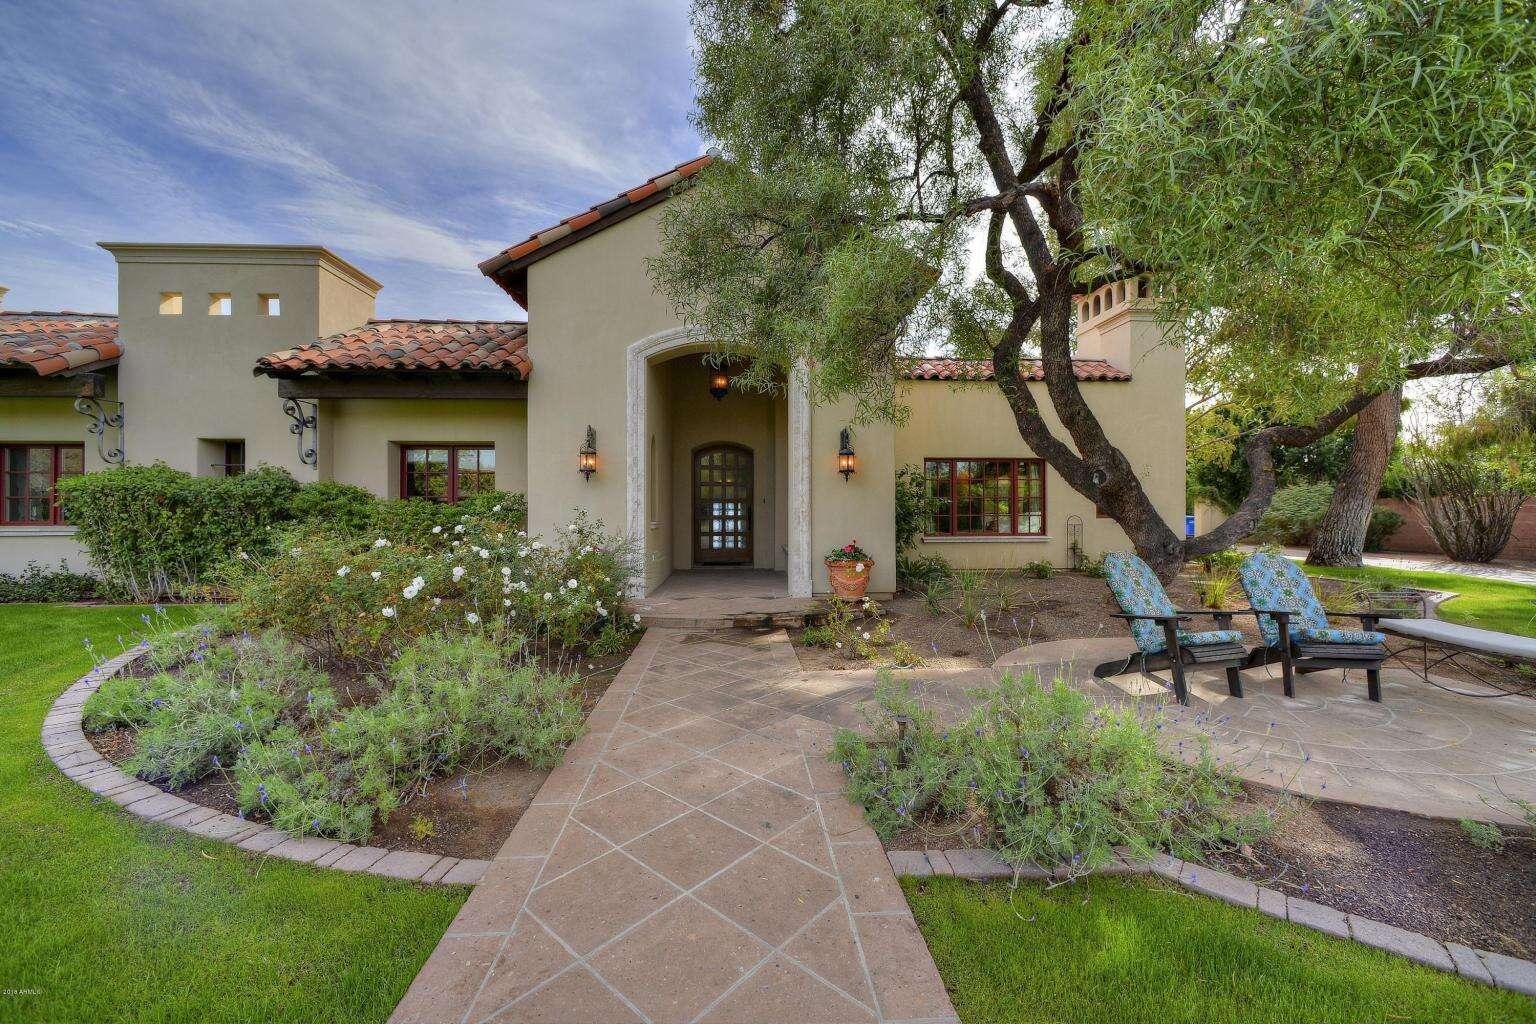 Single Family for Sale at 4619 N Dromedary Rd Phoenix, Arizona 85018 United States